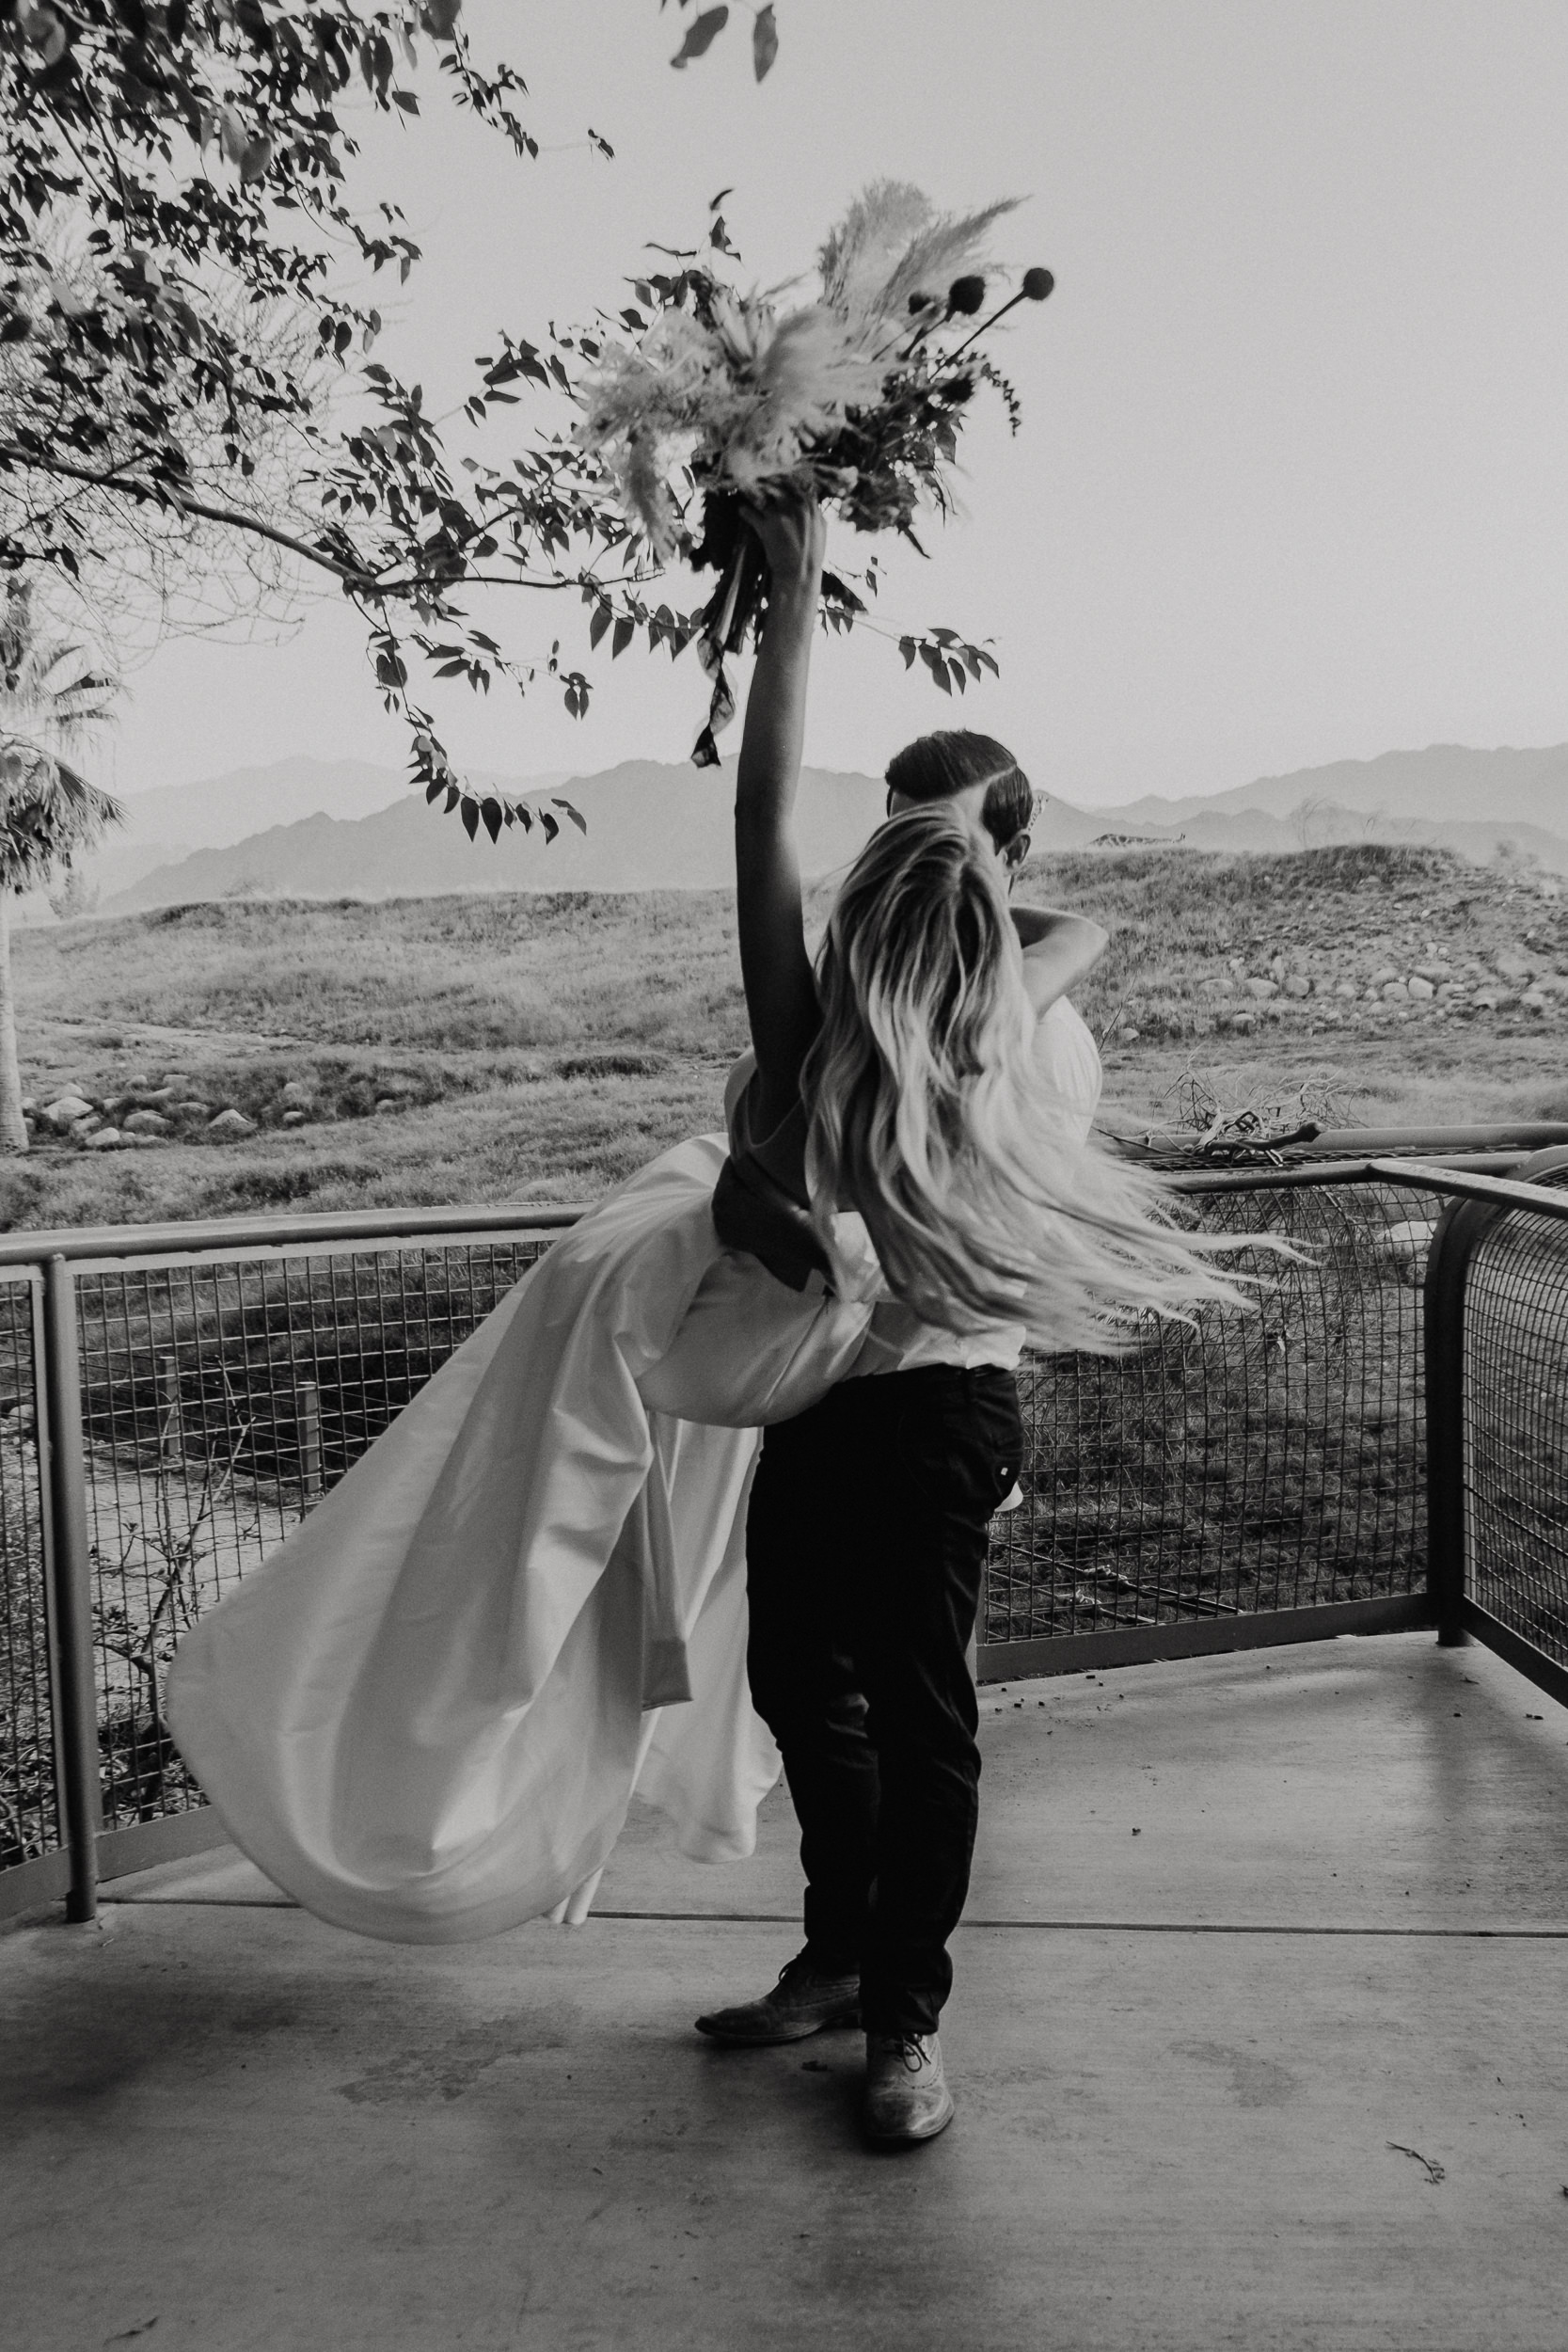 sChelsie + Chris - The Desert Shootout Wedding Romantics at The Living Desert-42.jpg